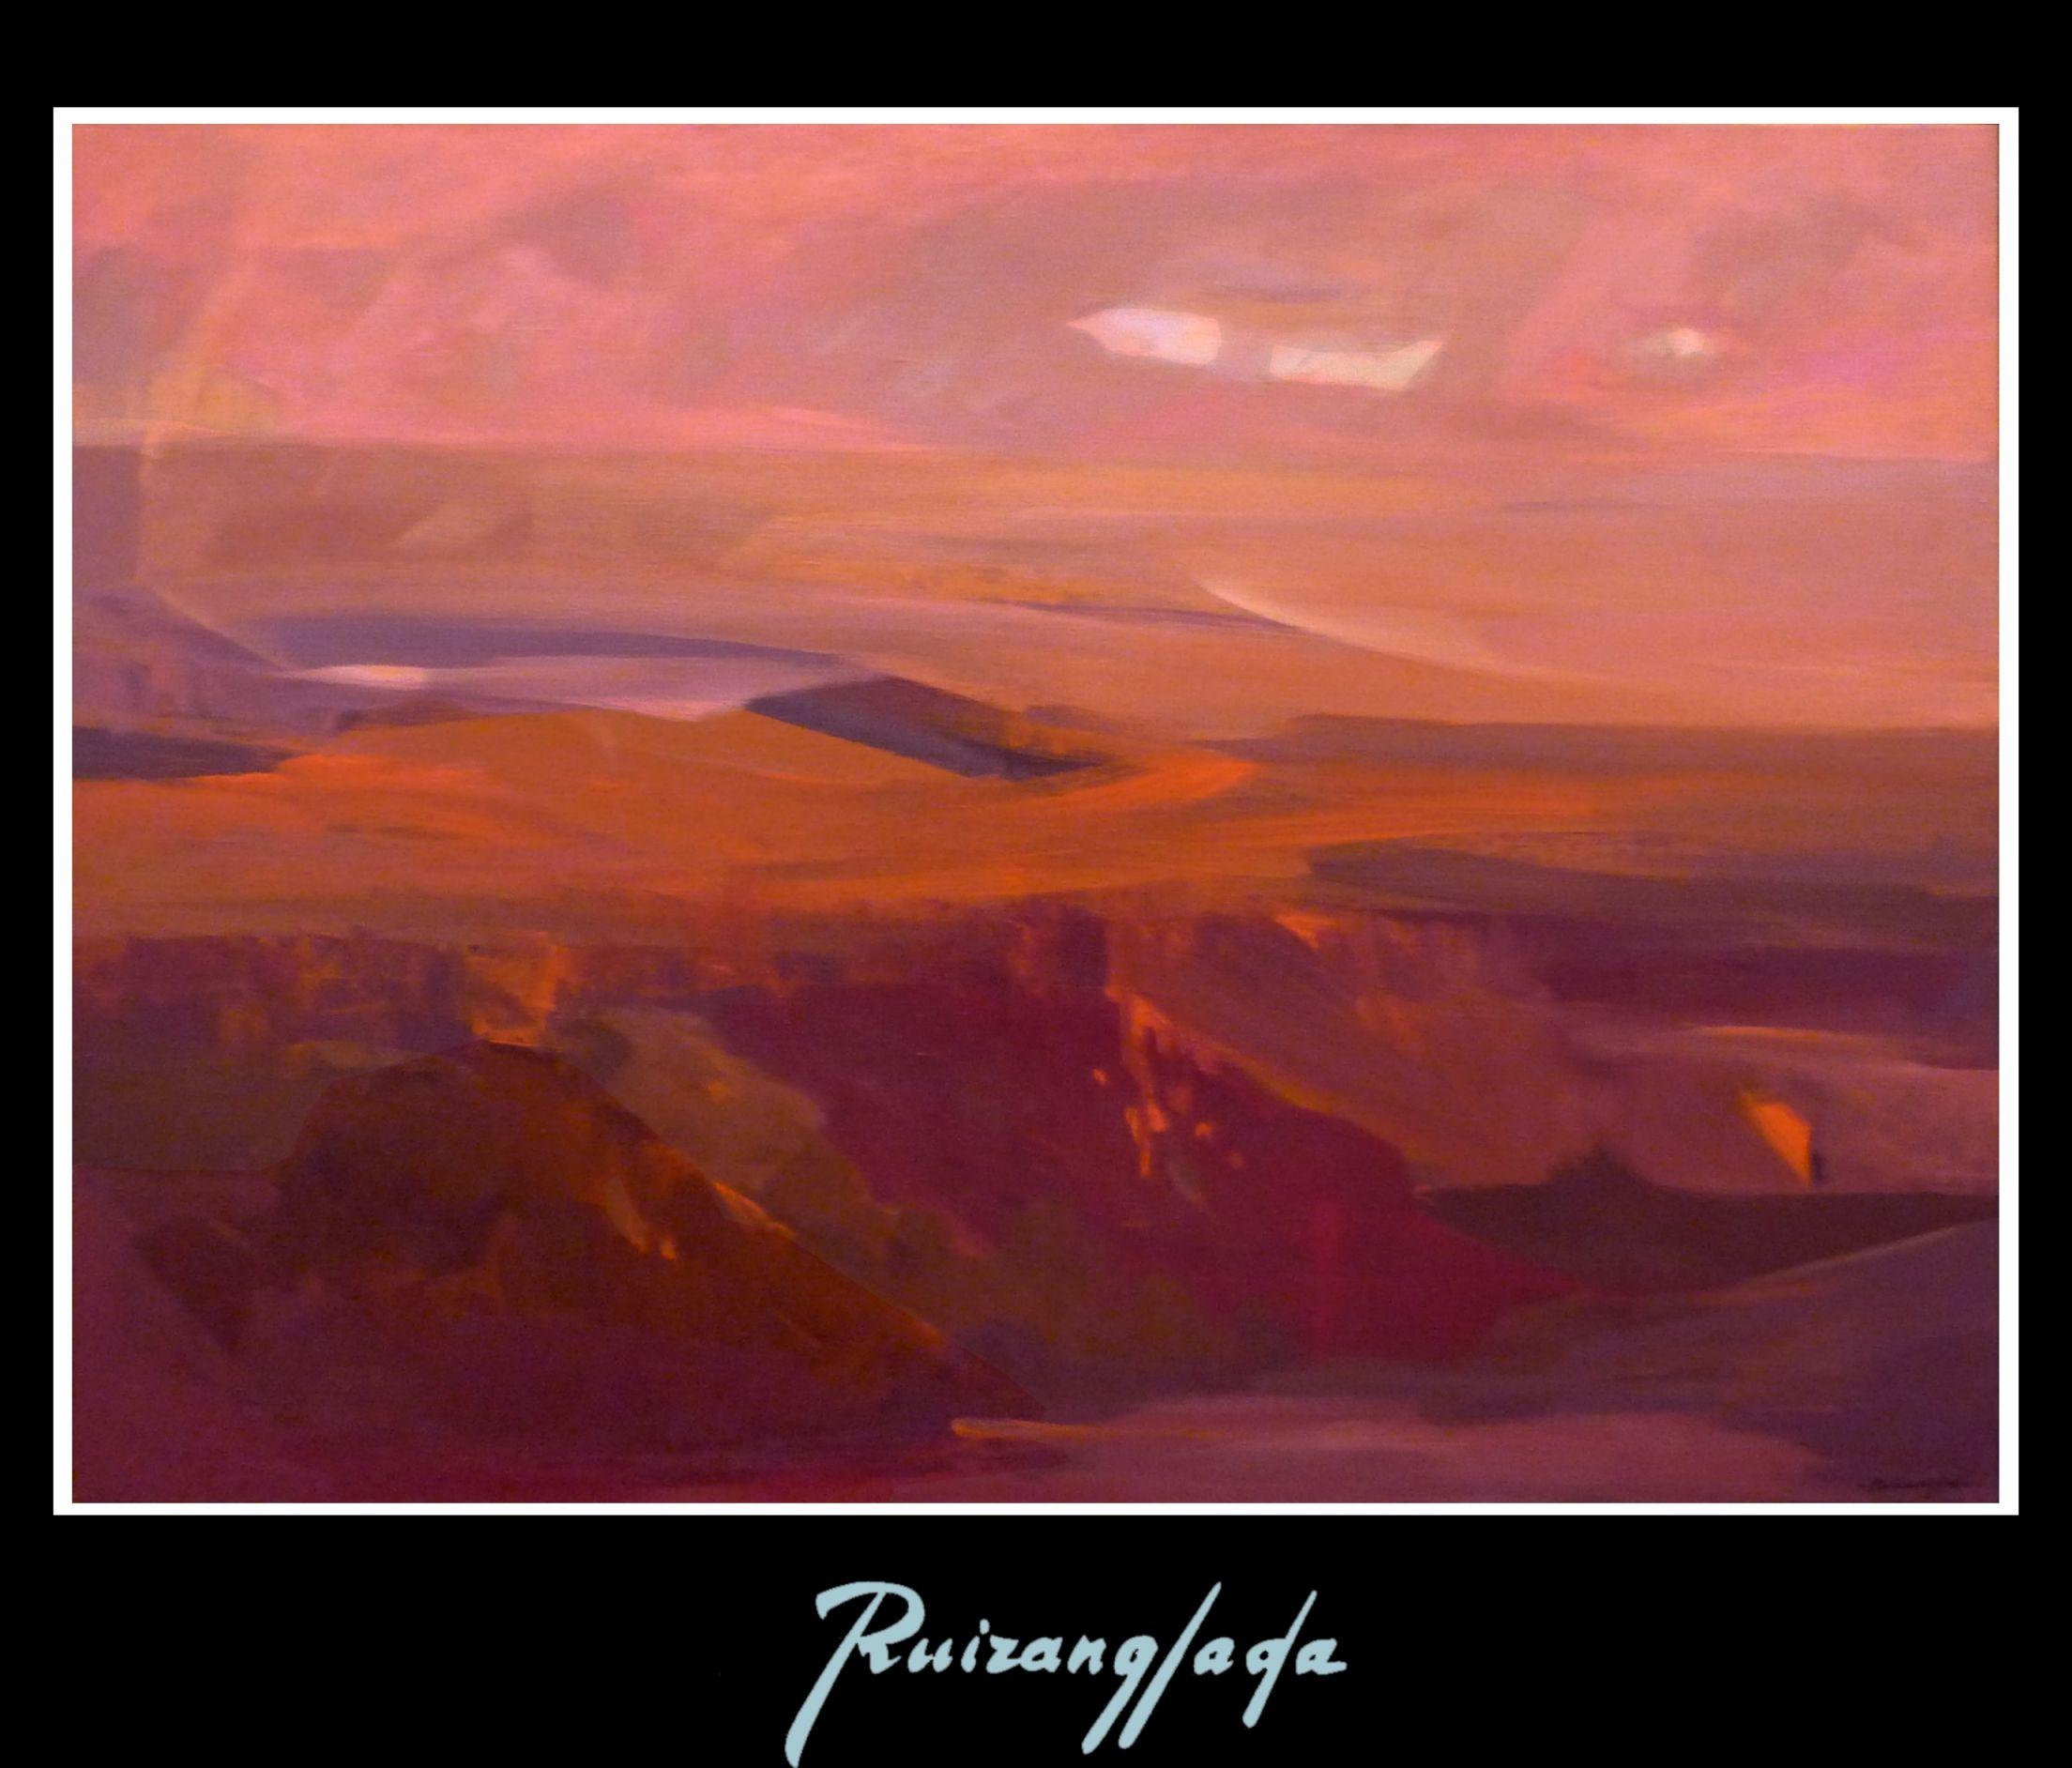 Paisaje al Atardecer. 97x130cm. Acrílico sobre lienzo. (1984) - Martín Ruiz Anglada - Ruizanglada